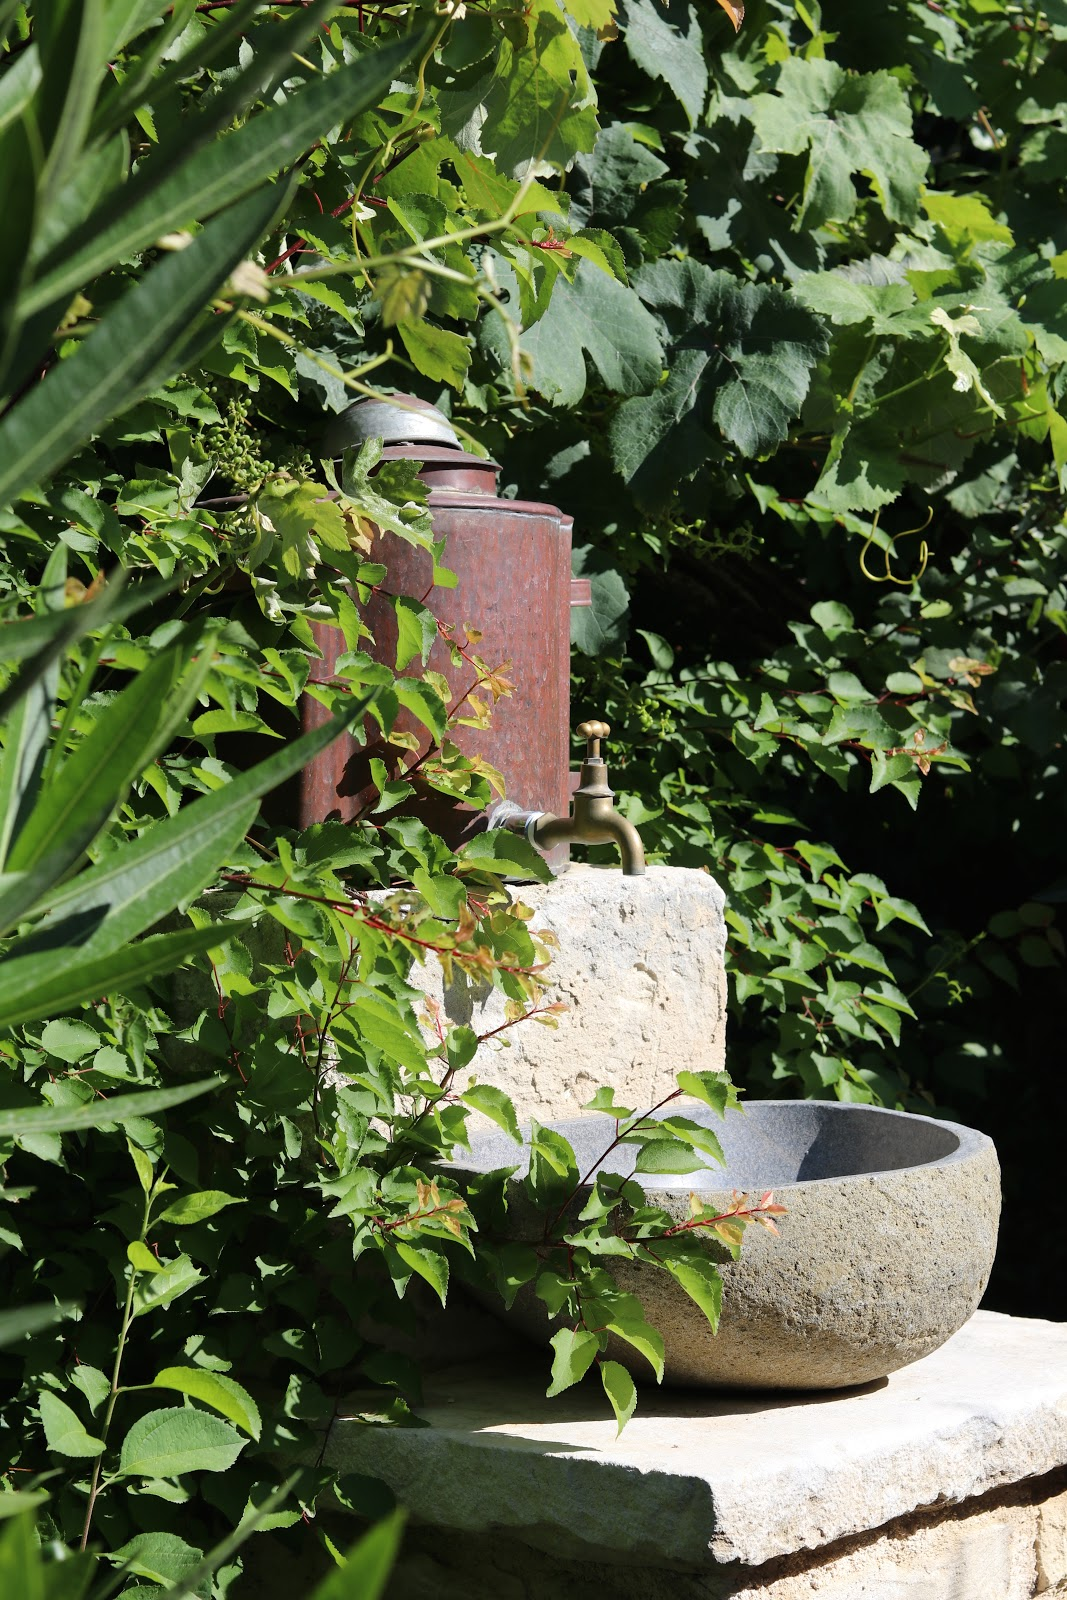 Stone outdoor sink, F Zeen Resort, Unique Villas, Kefalonia